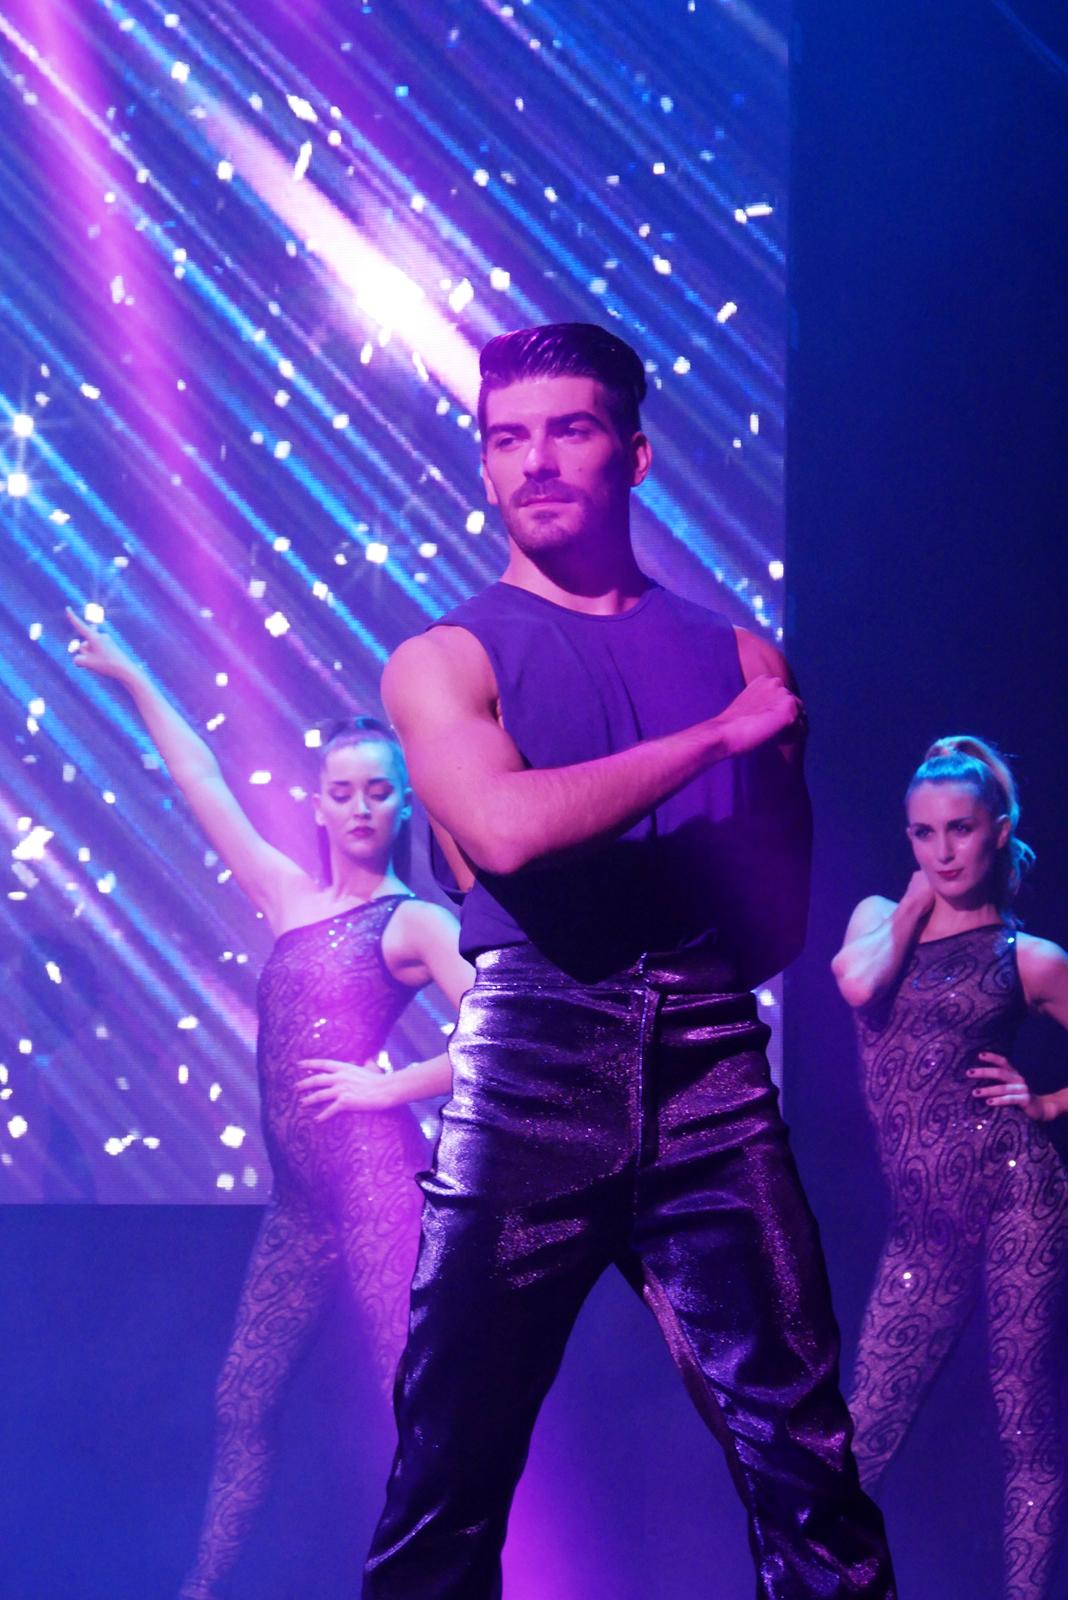 saturday-night-fever-le-spectacle-fievre-du-samedi-soir-troupe-danseurs-comedie-musicale-photo-usofparis-blog